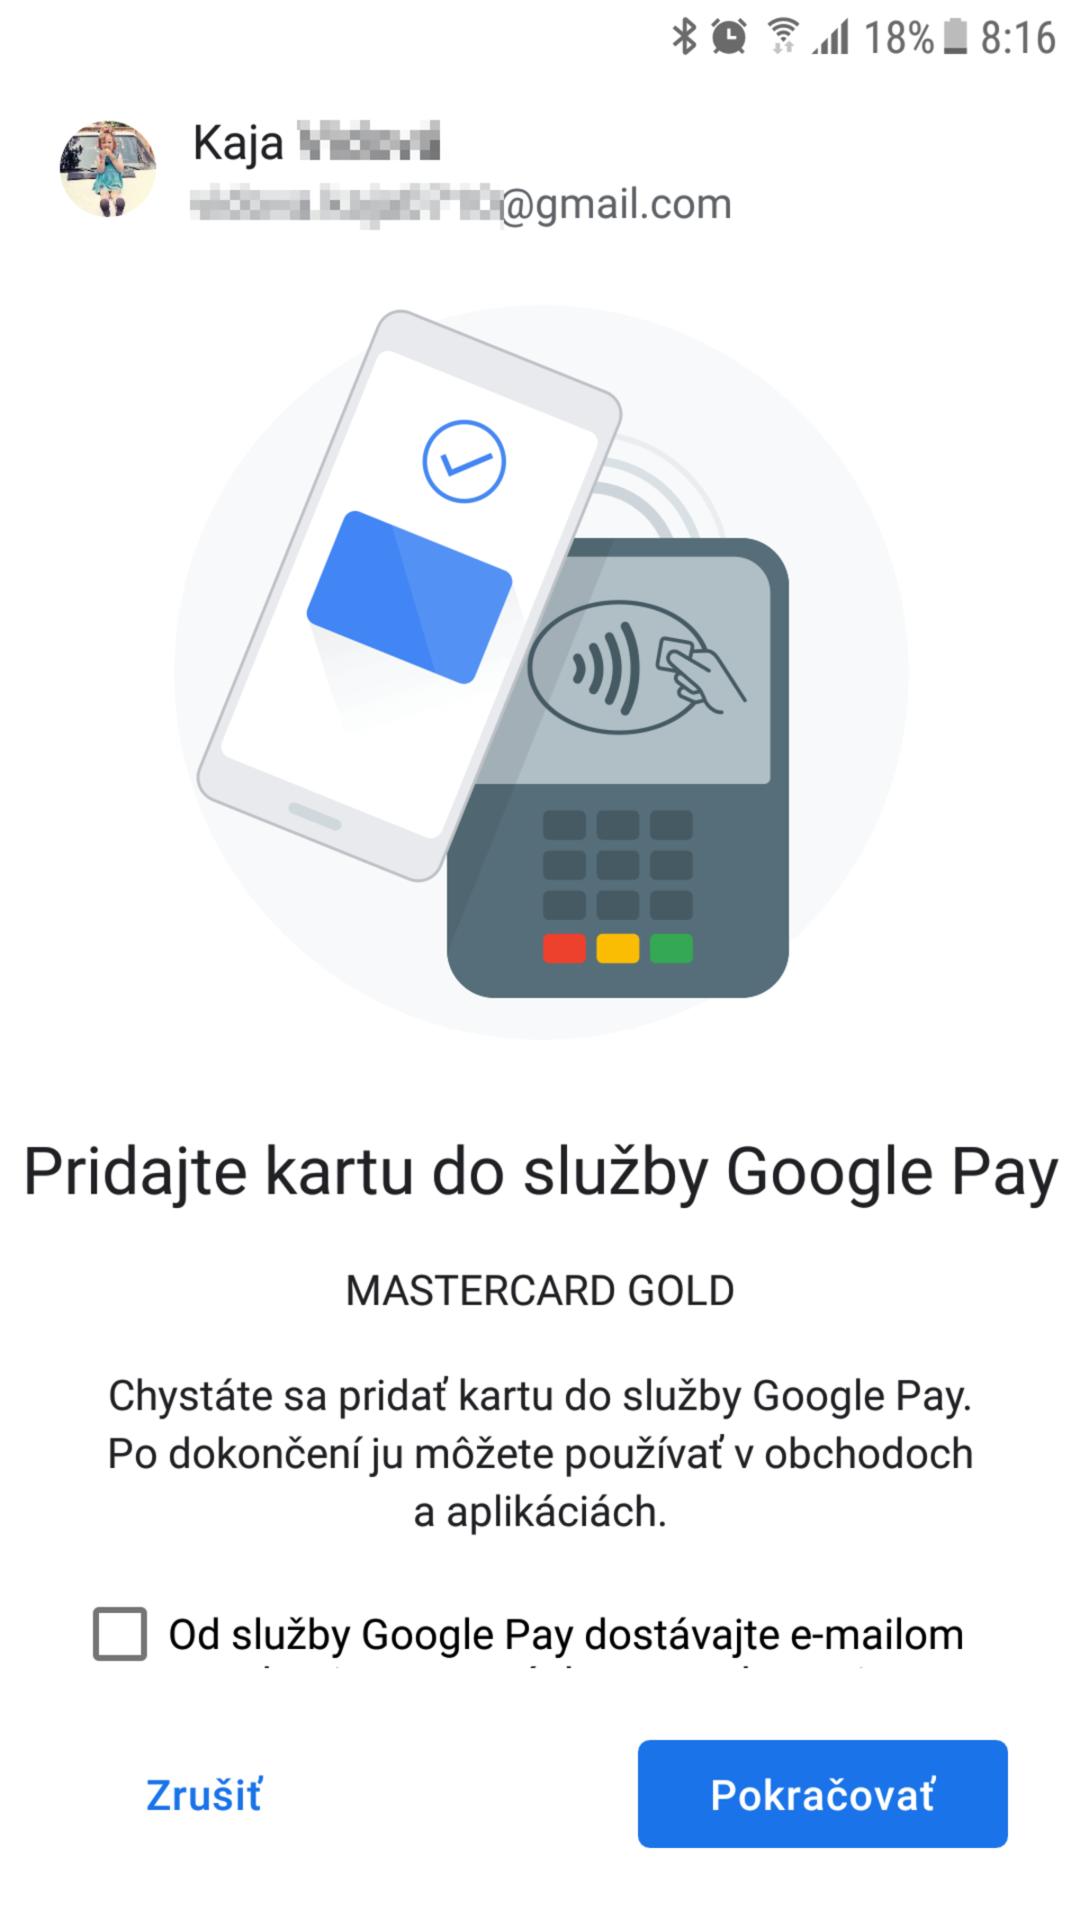 Platby Mobilom Cez Google Pay Uz Funguju Aj Na Slovensku